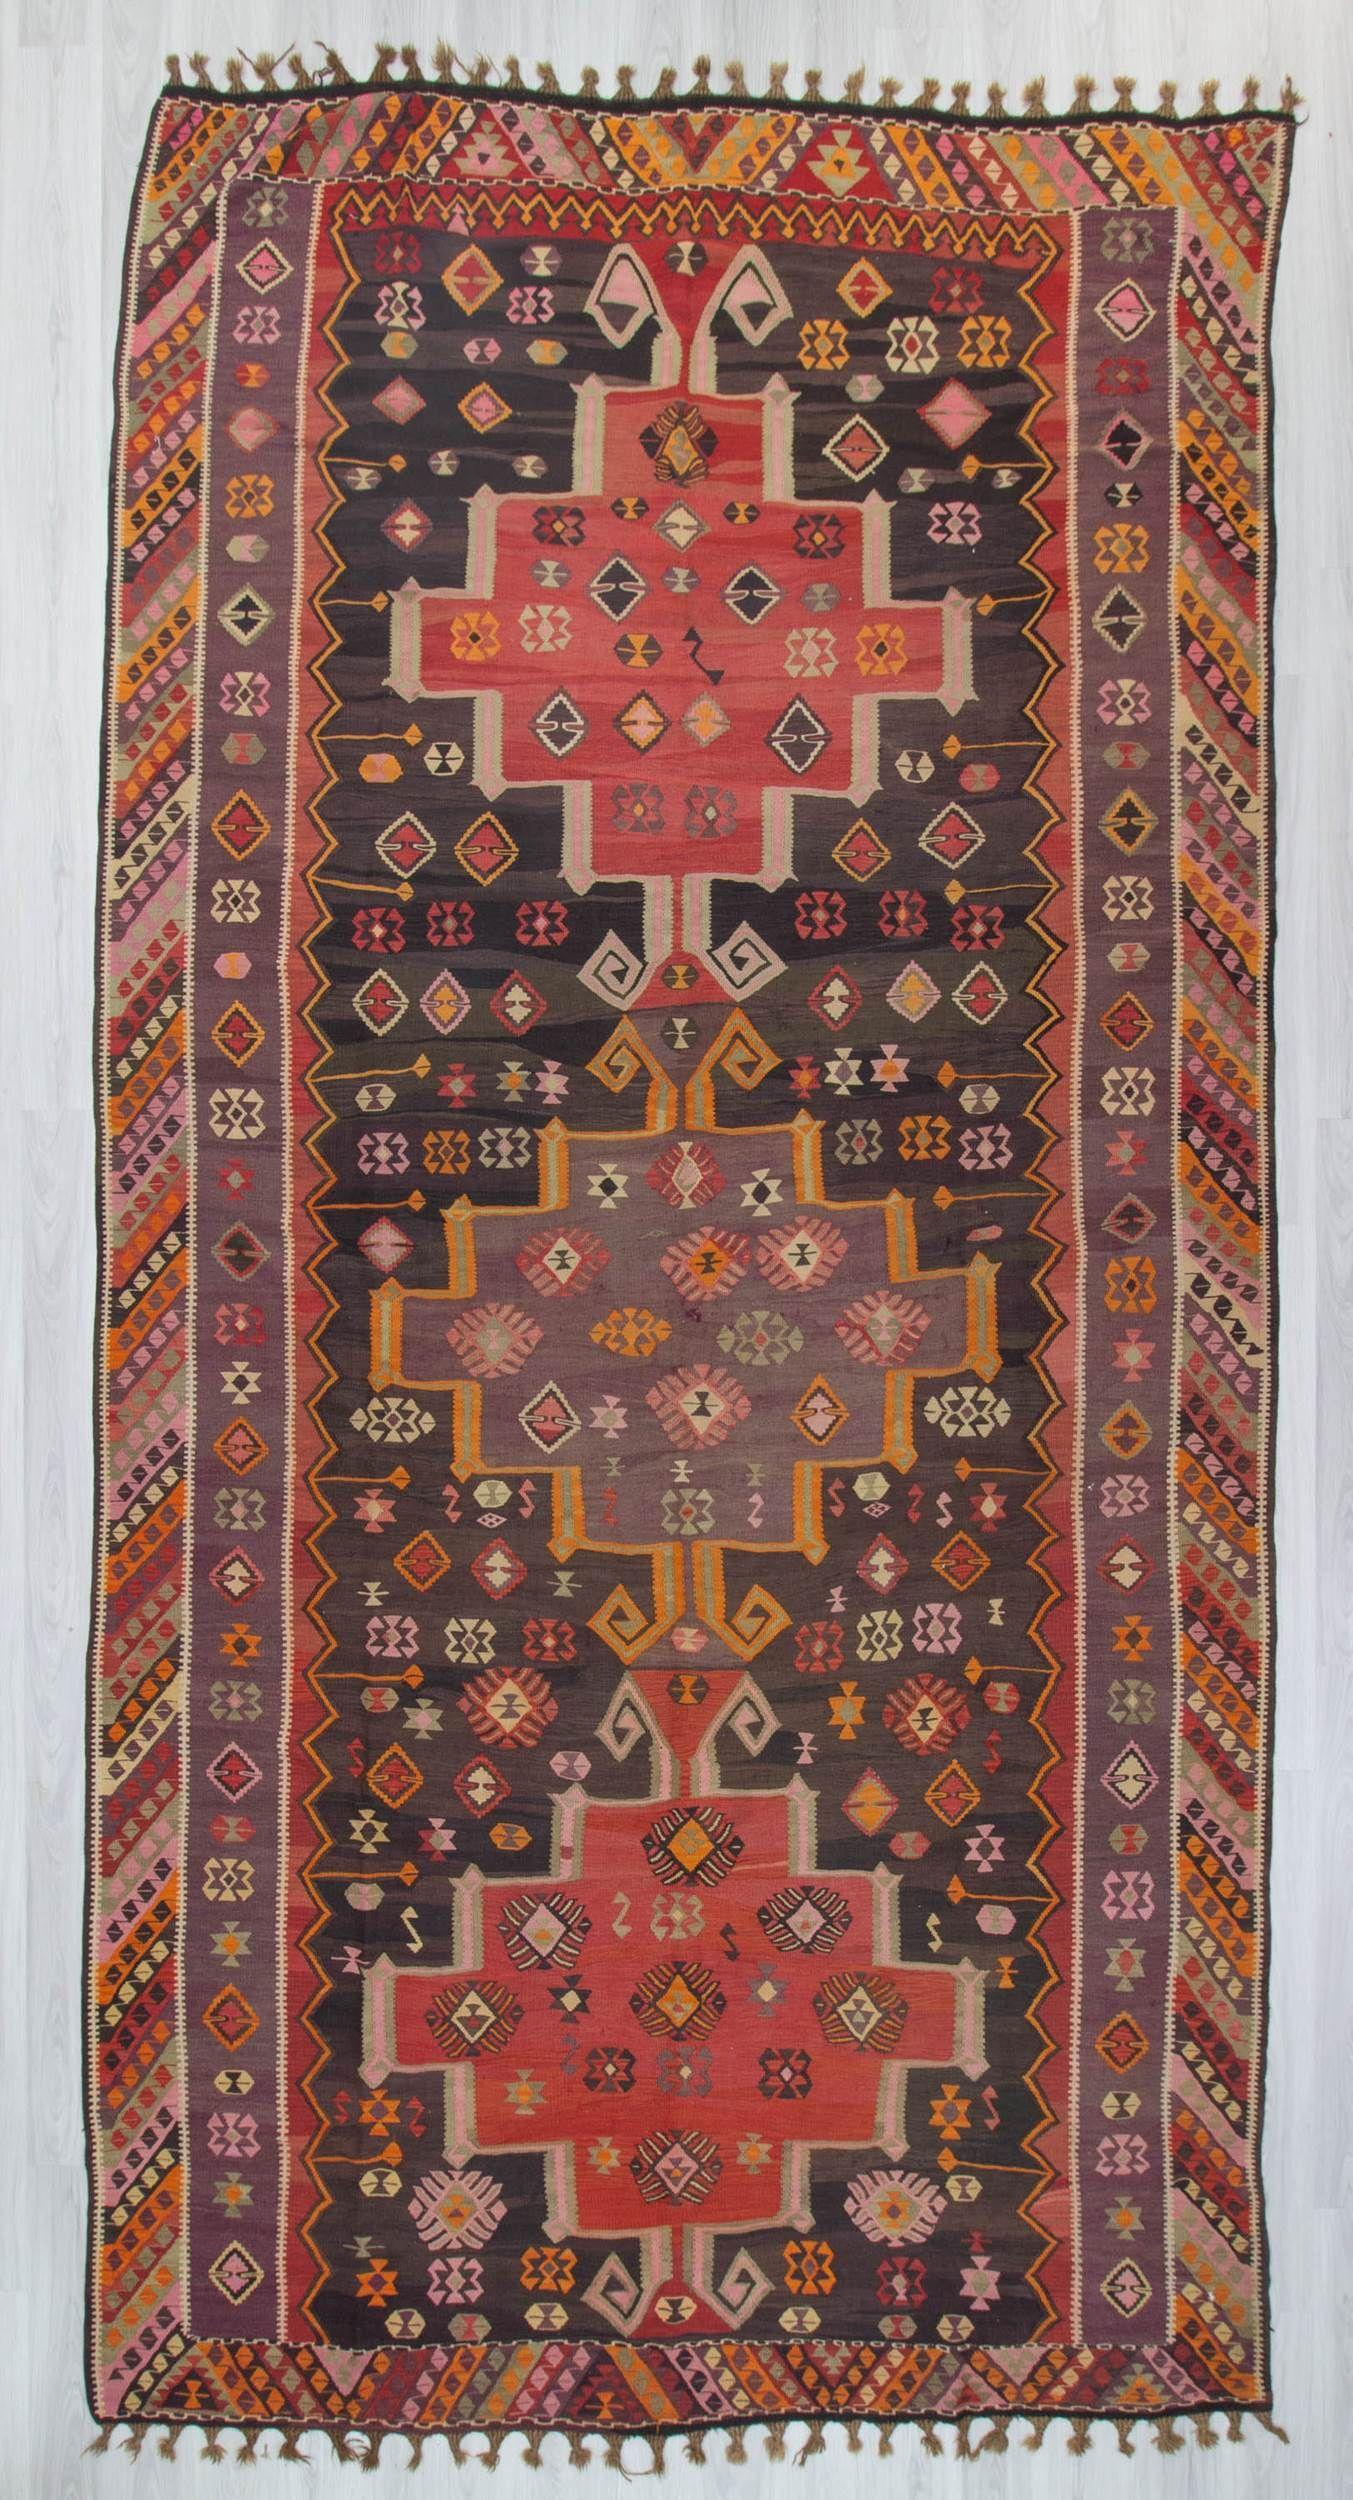 Handwoven vintage decorative oversize turkish kilim rug in